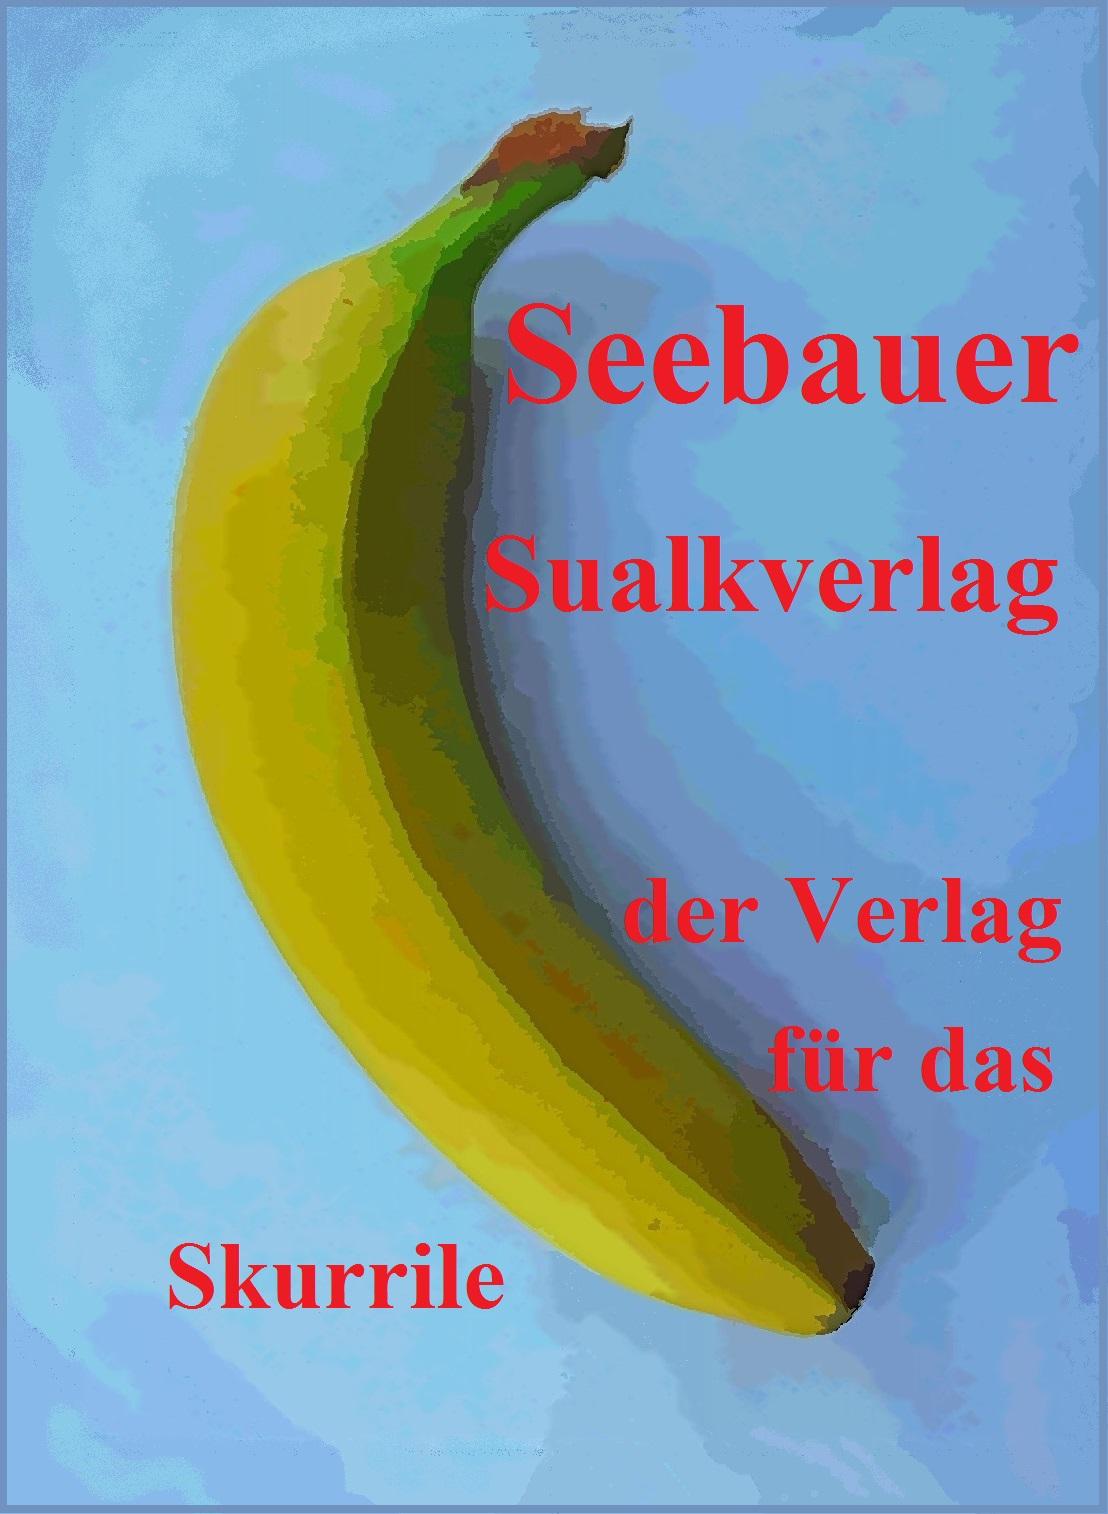 Logo-Seebauer-Sualkverlag